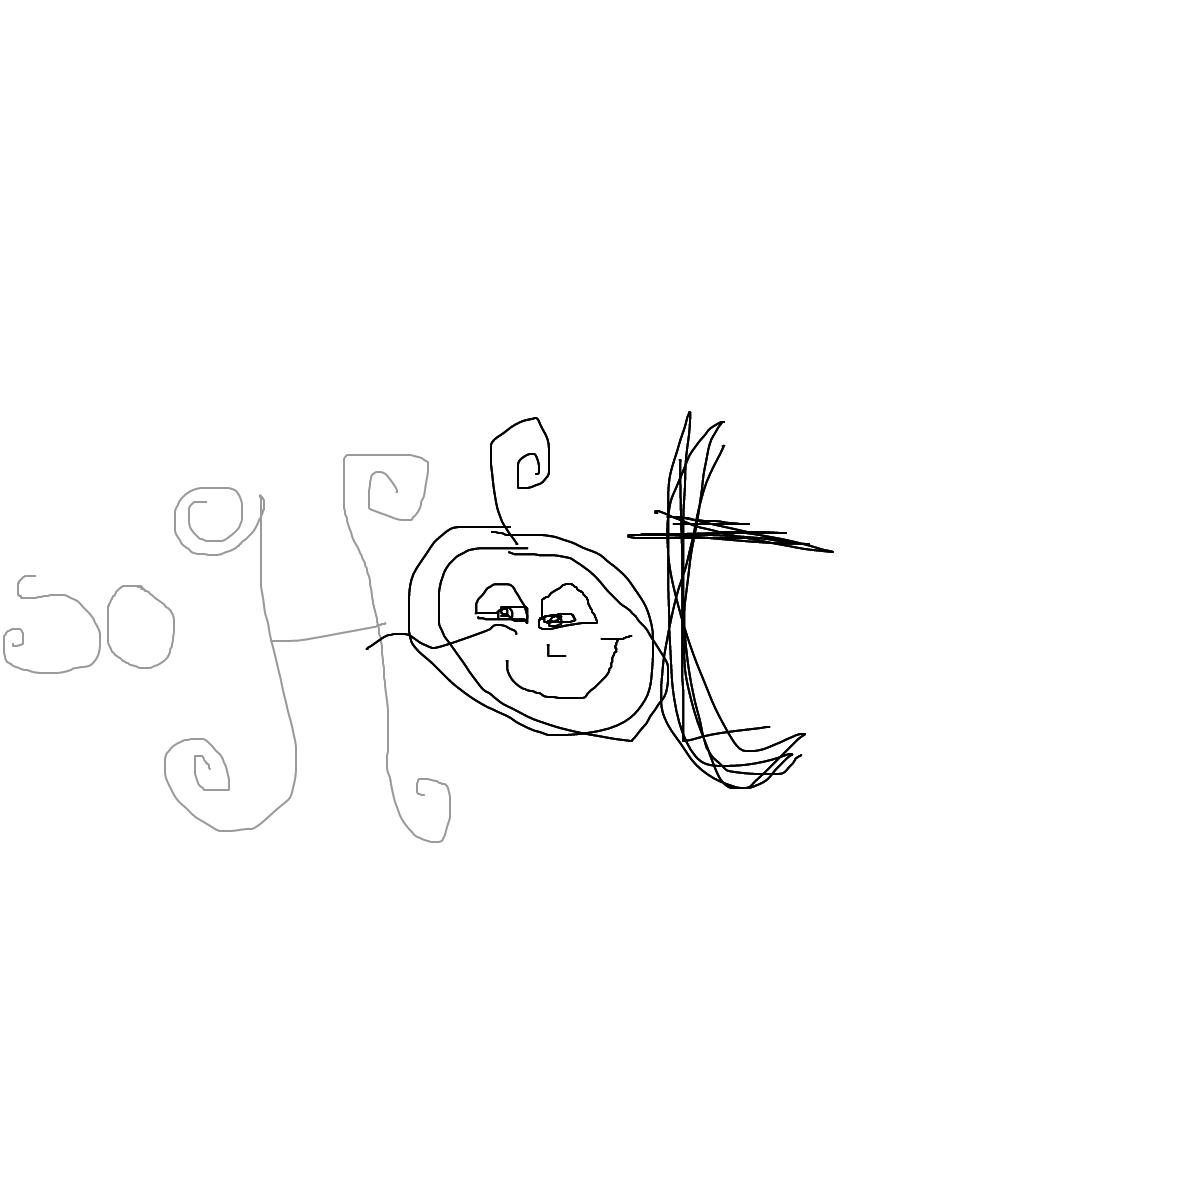 BAAAM drawing#721 lat:52.0848007202148440lng: 5.1685485839843750